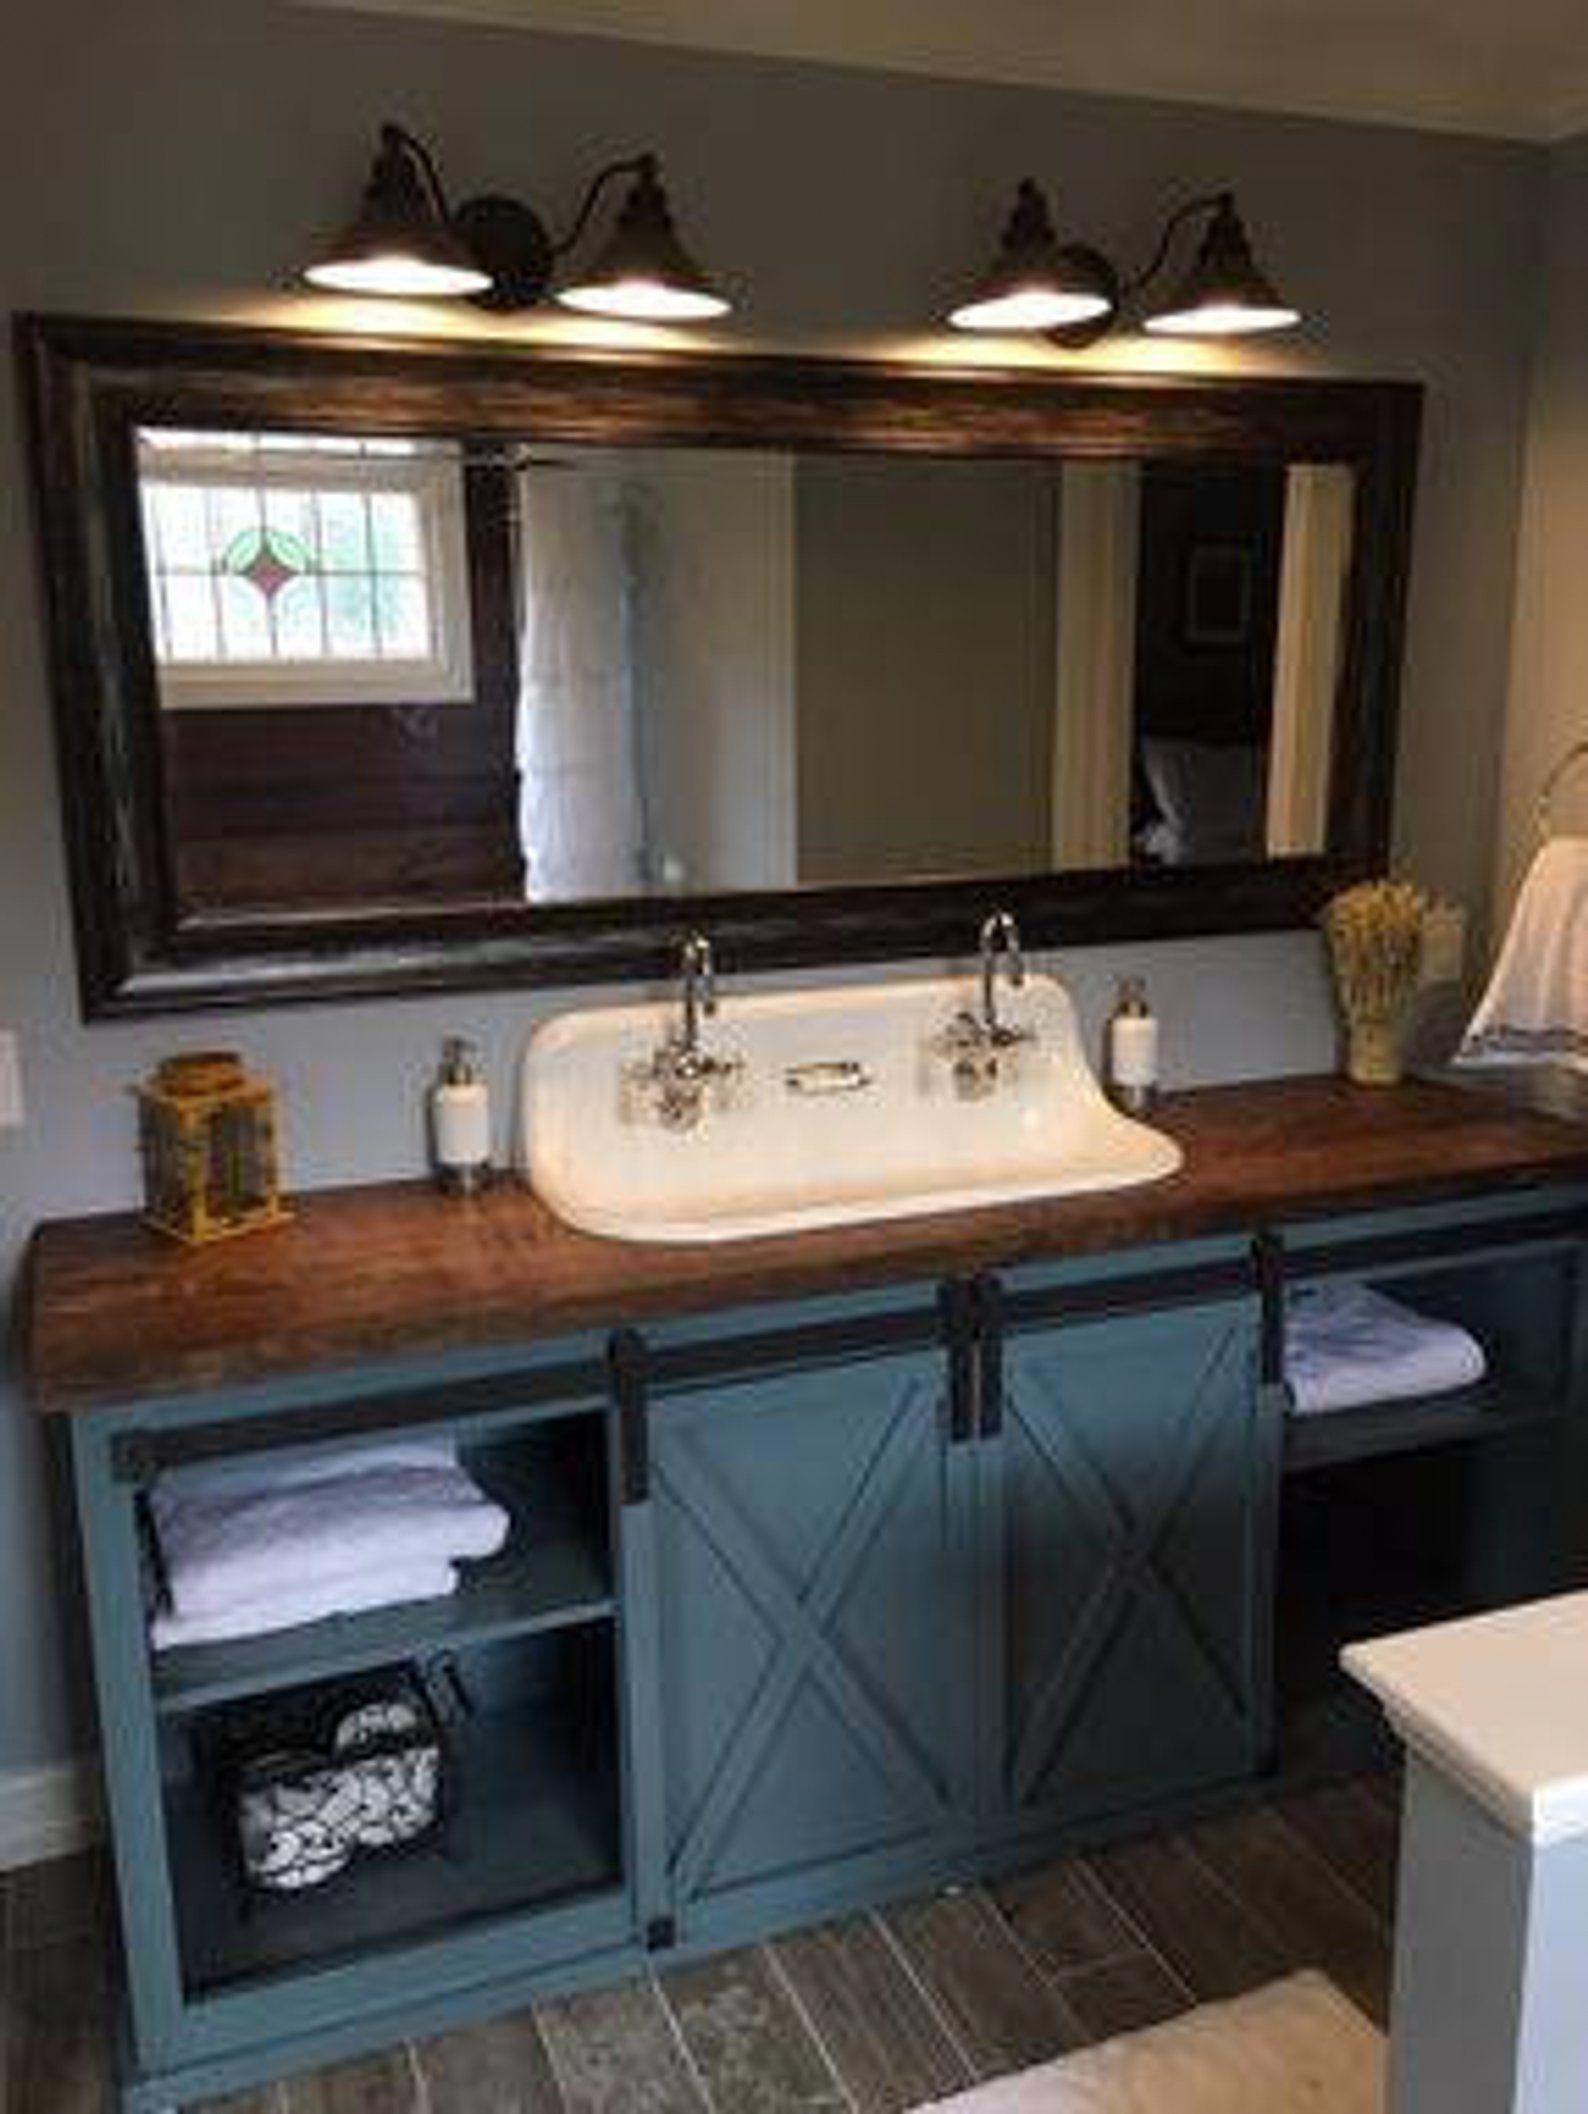 Barn Door Bathroom Vanity Free Shipping Etsy Bathroomsink Bathroom Design Bathroom Makeover Bathroom Styling [ 2114 x 1588 Pixel ]